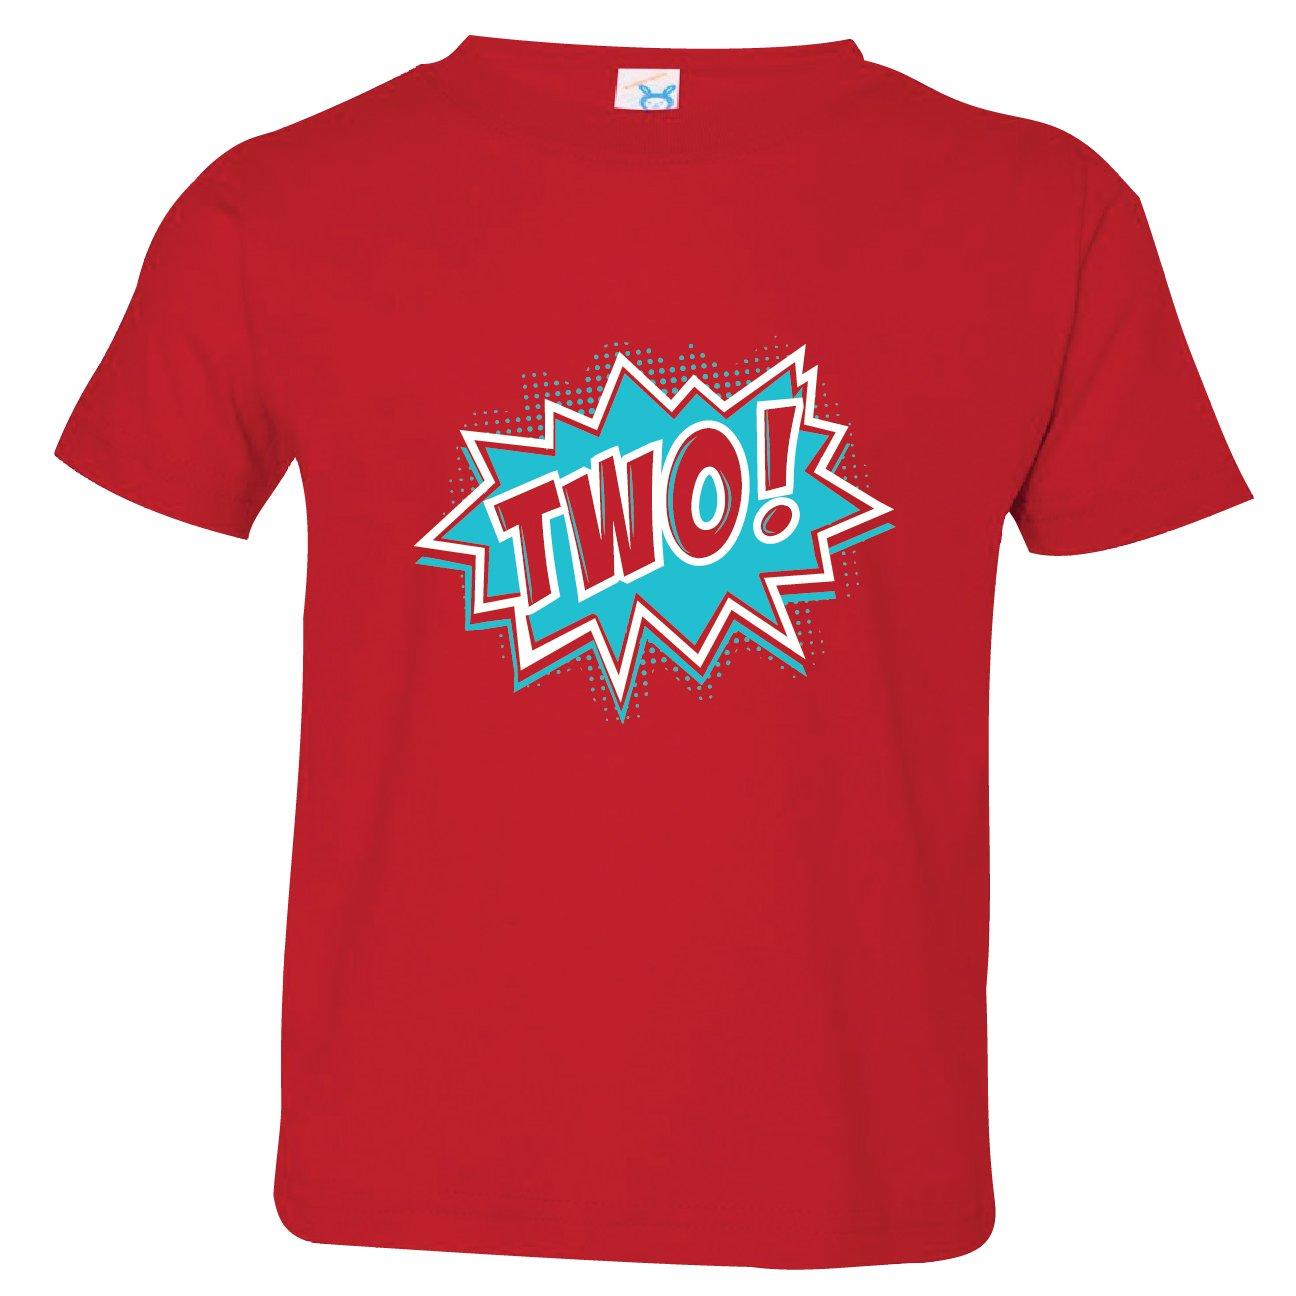 Kids Shirt for First Birthday Comic Book Birthday Shirt Texas Tees Superhero Shirts